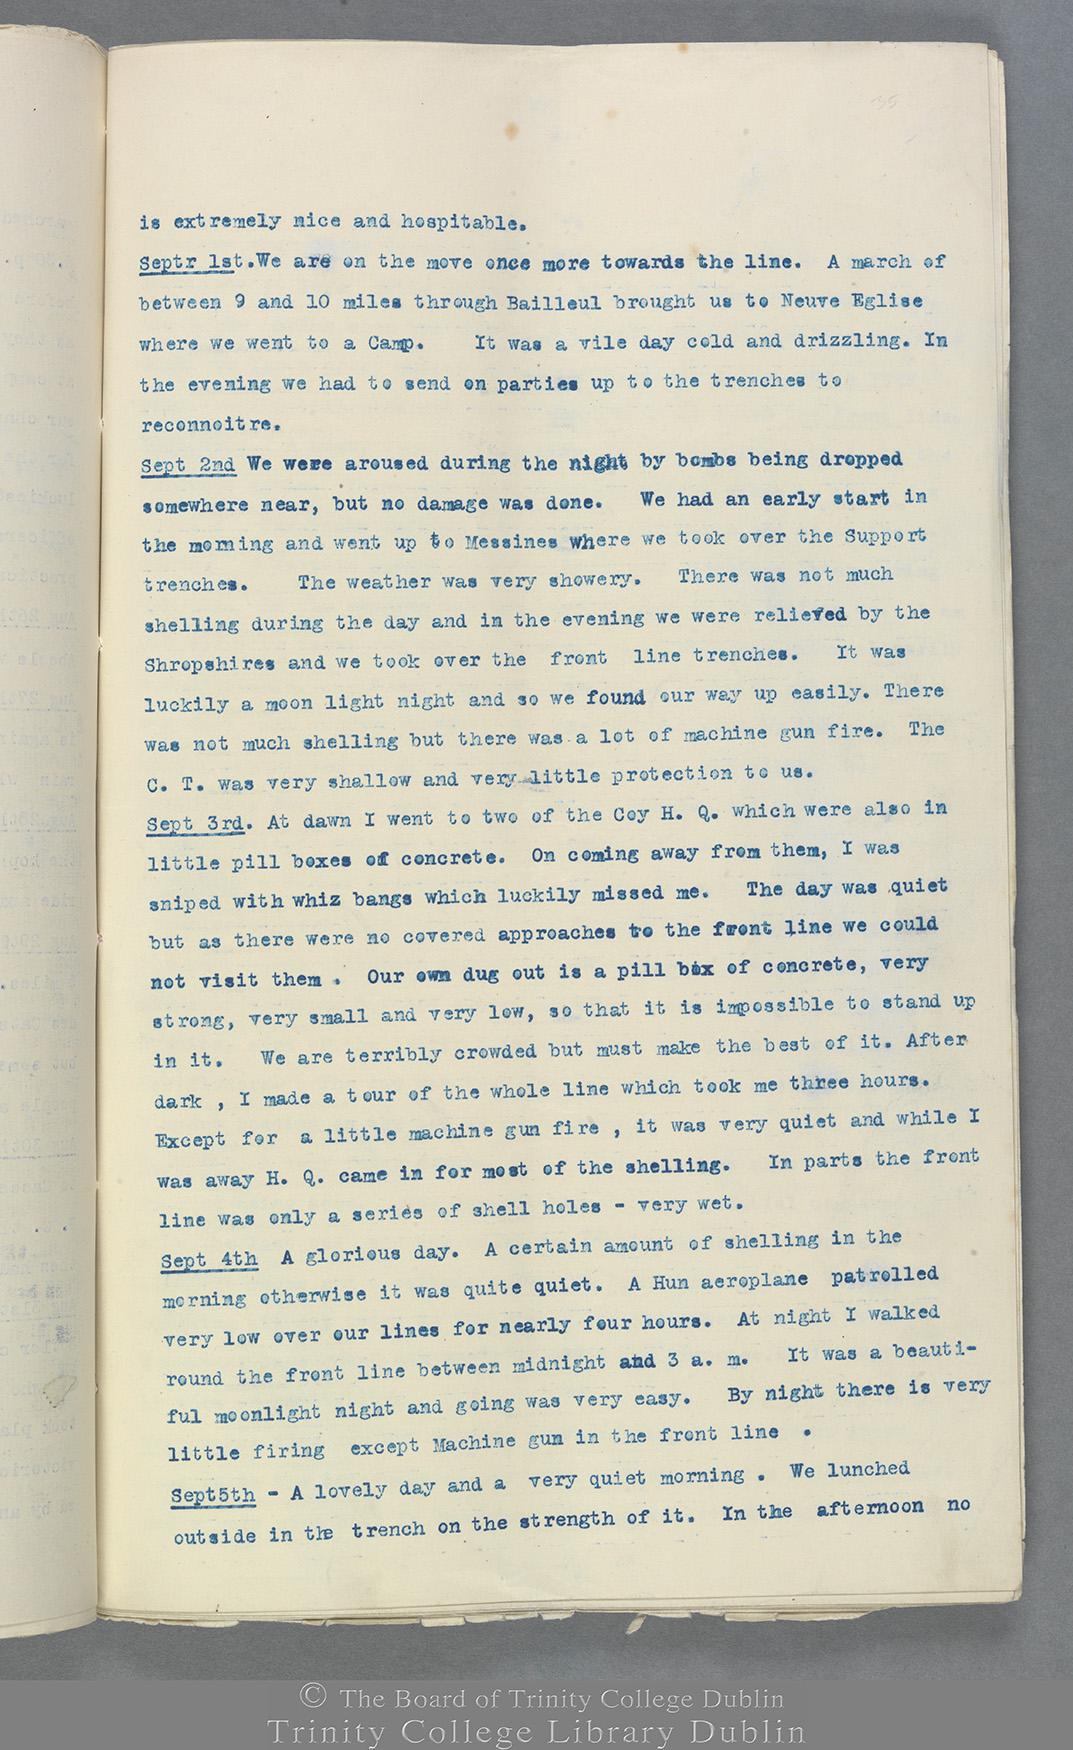 TCD MS 10822 folio 35 recto